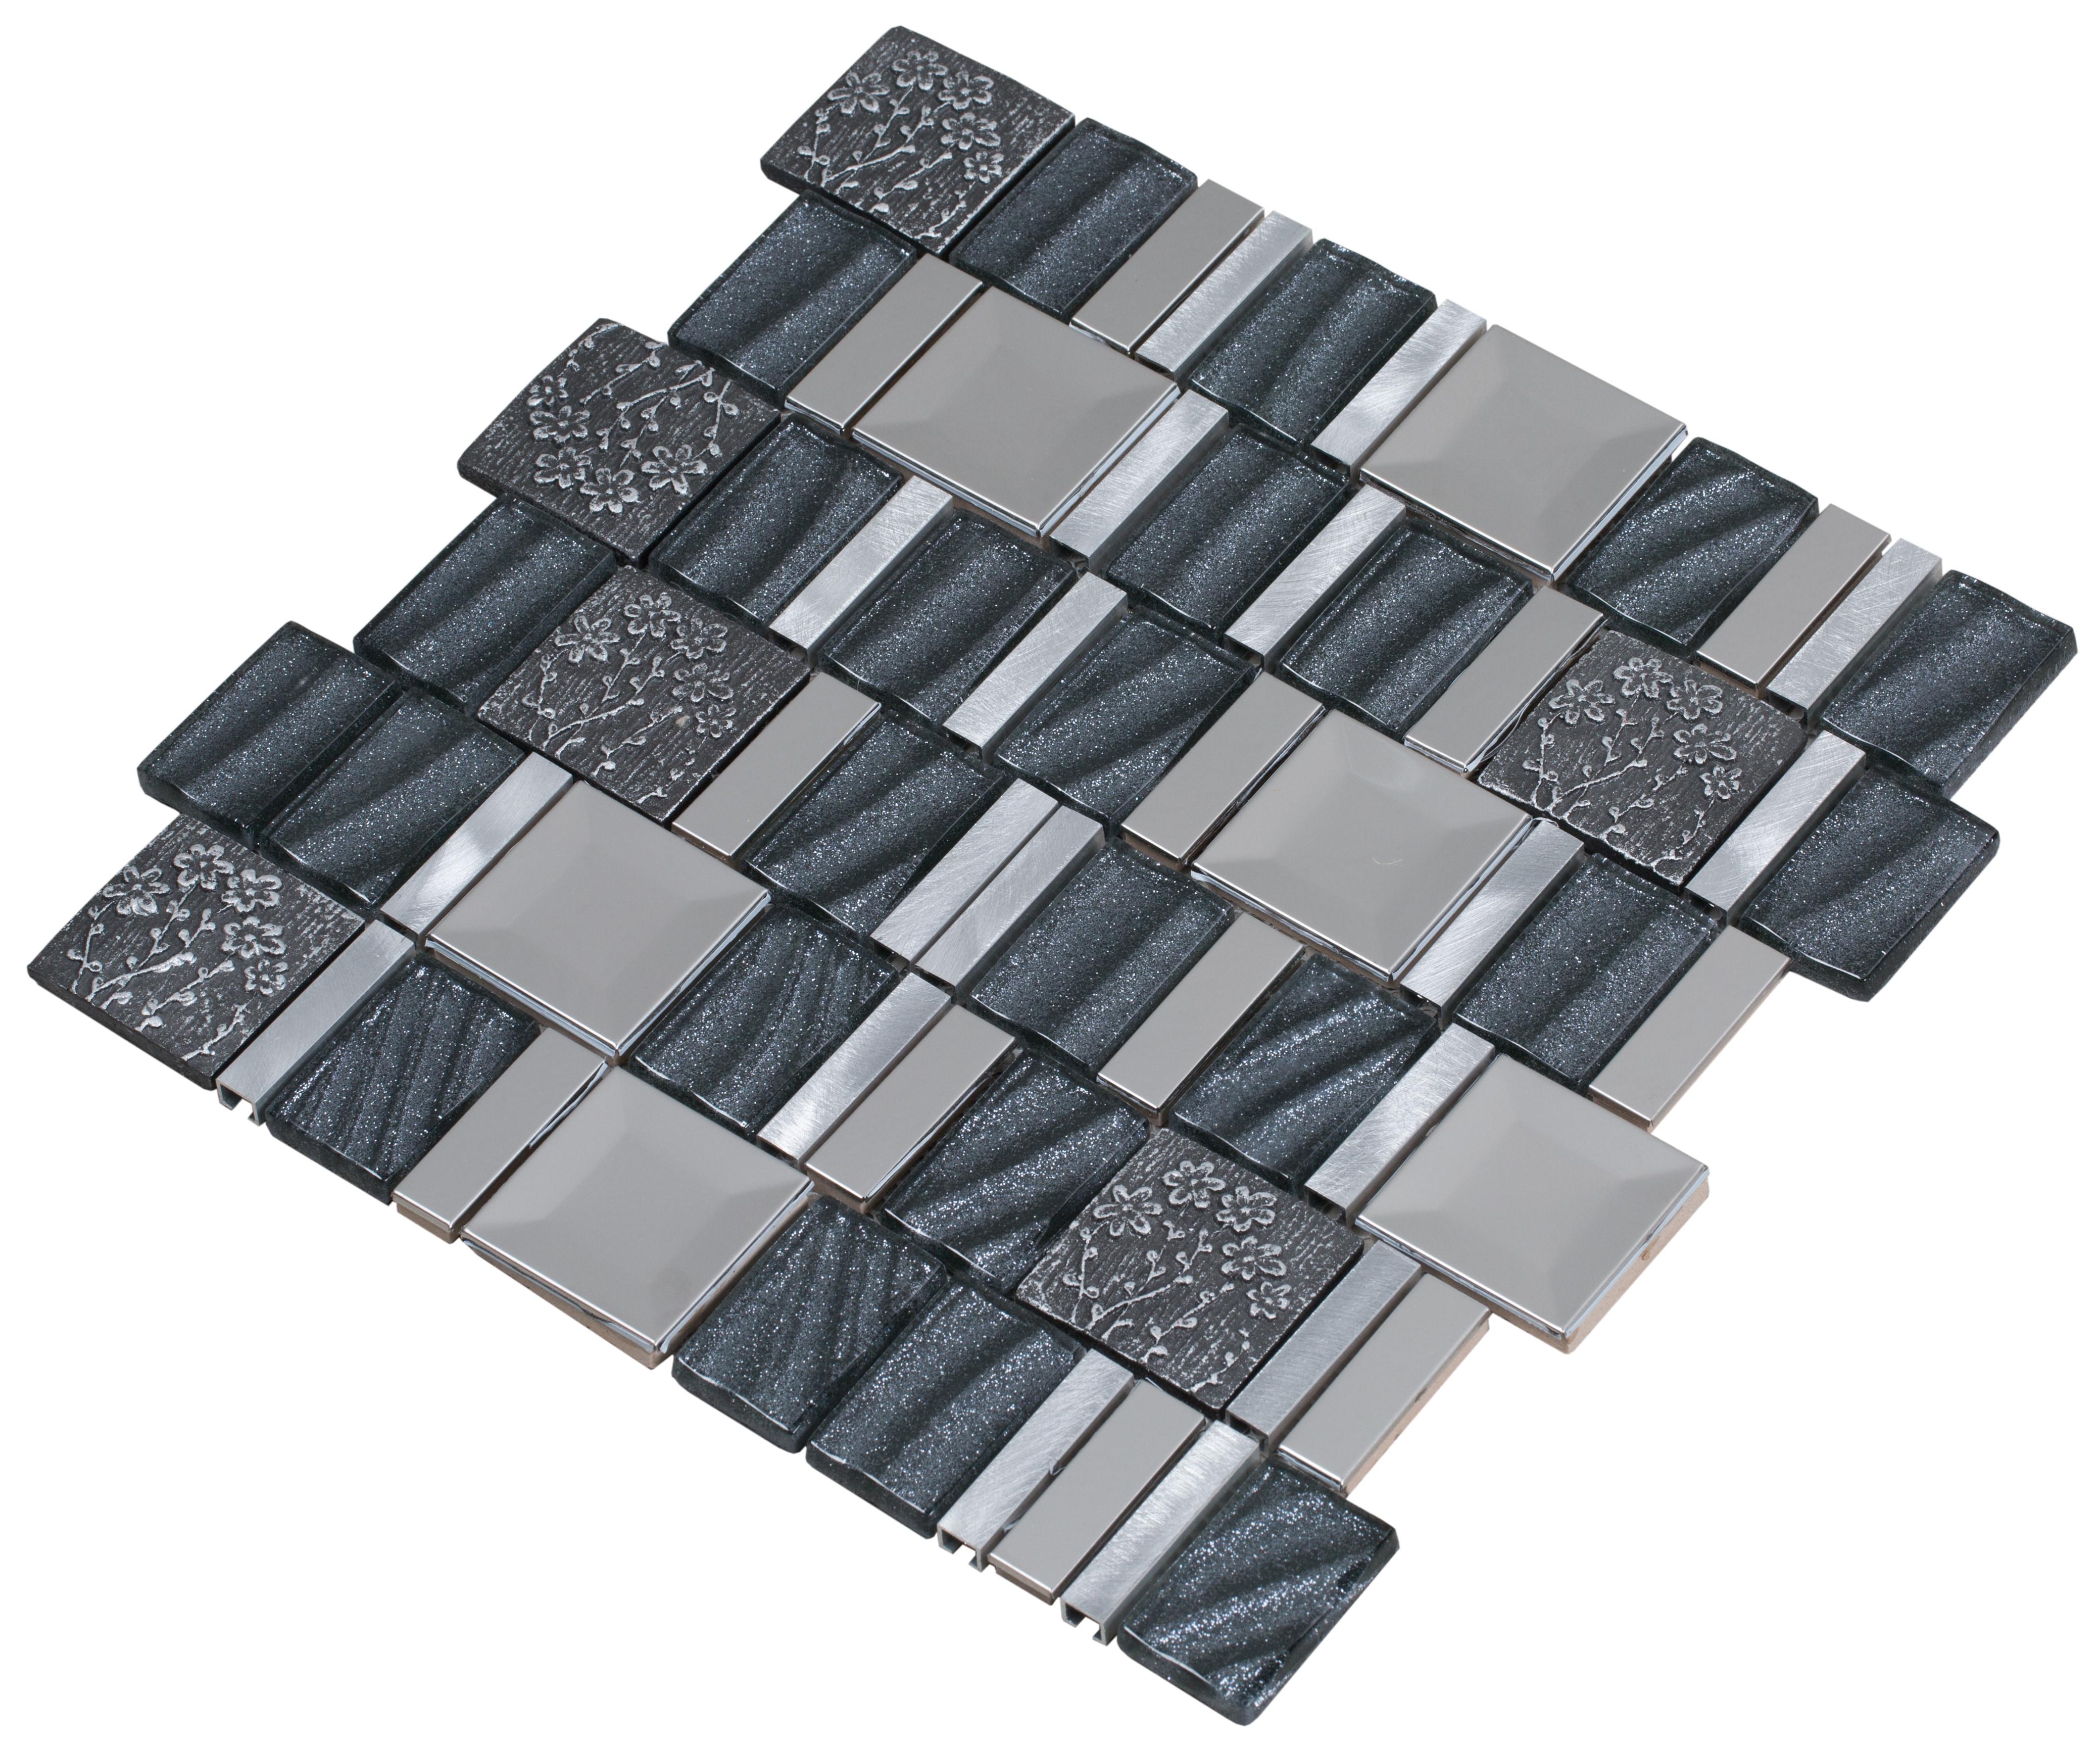 Stainless steel, hand painted ceramics, aluminum, and gray sequined glass / Interlocking Vitray Series 0